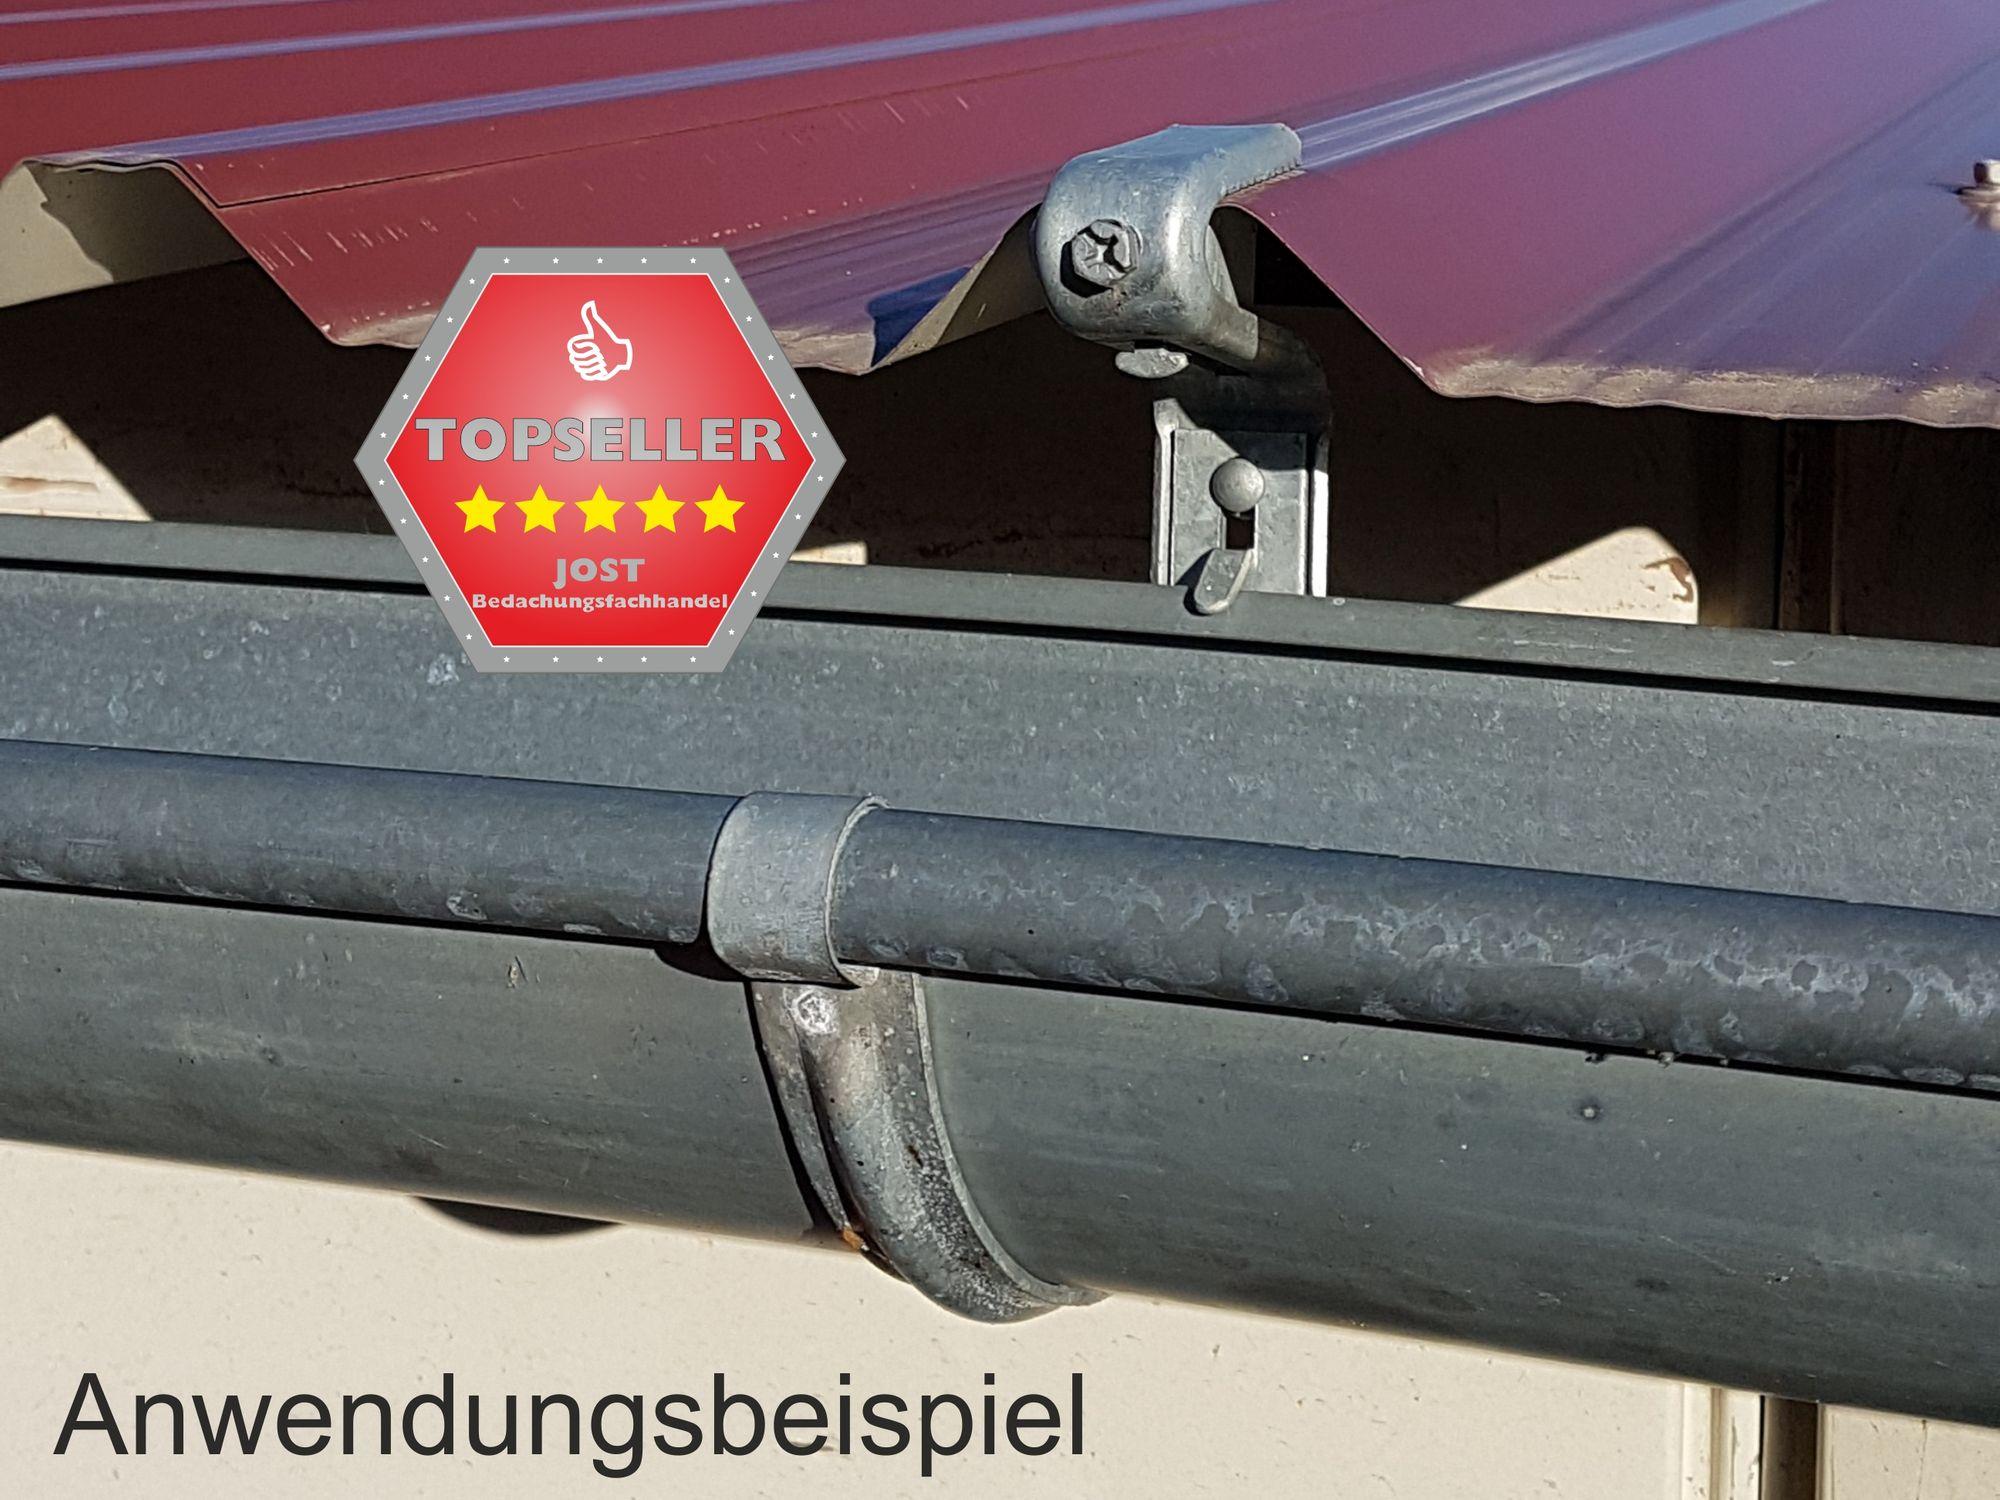 verzinkt rinnenhalter trapezblech wellplatten 6-tlg./333 dachrinne